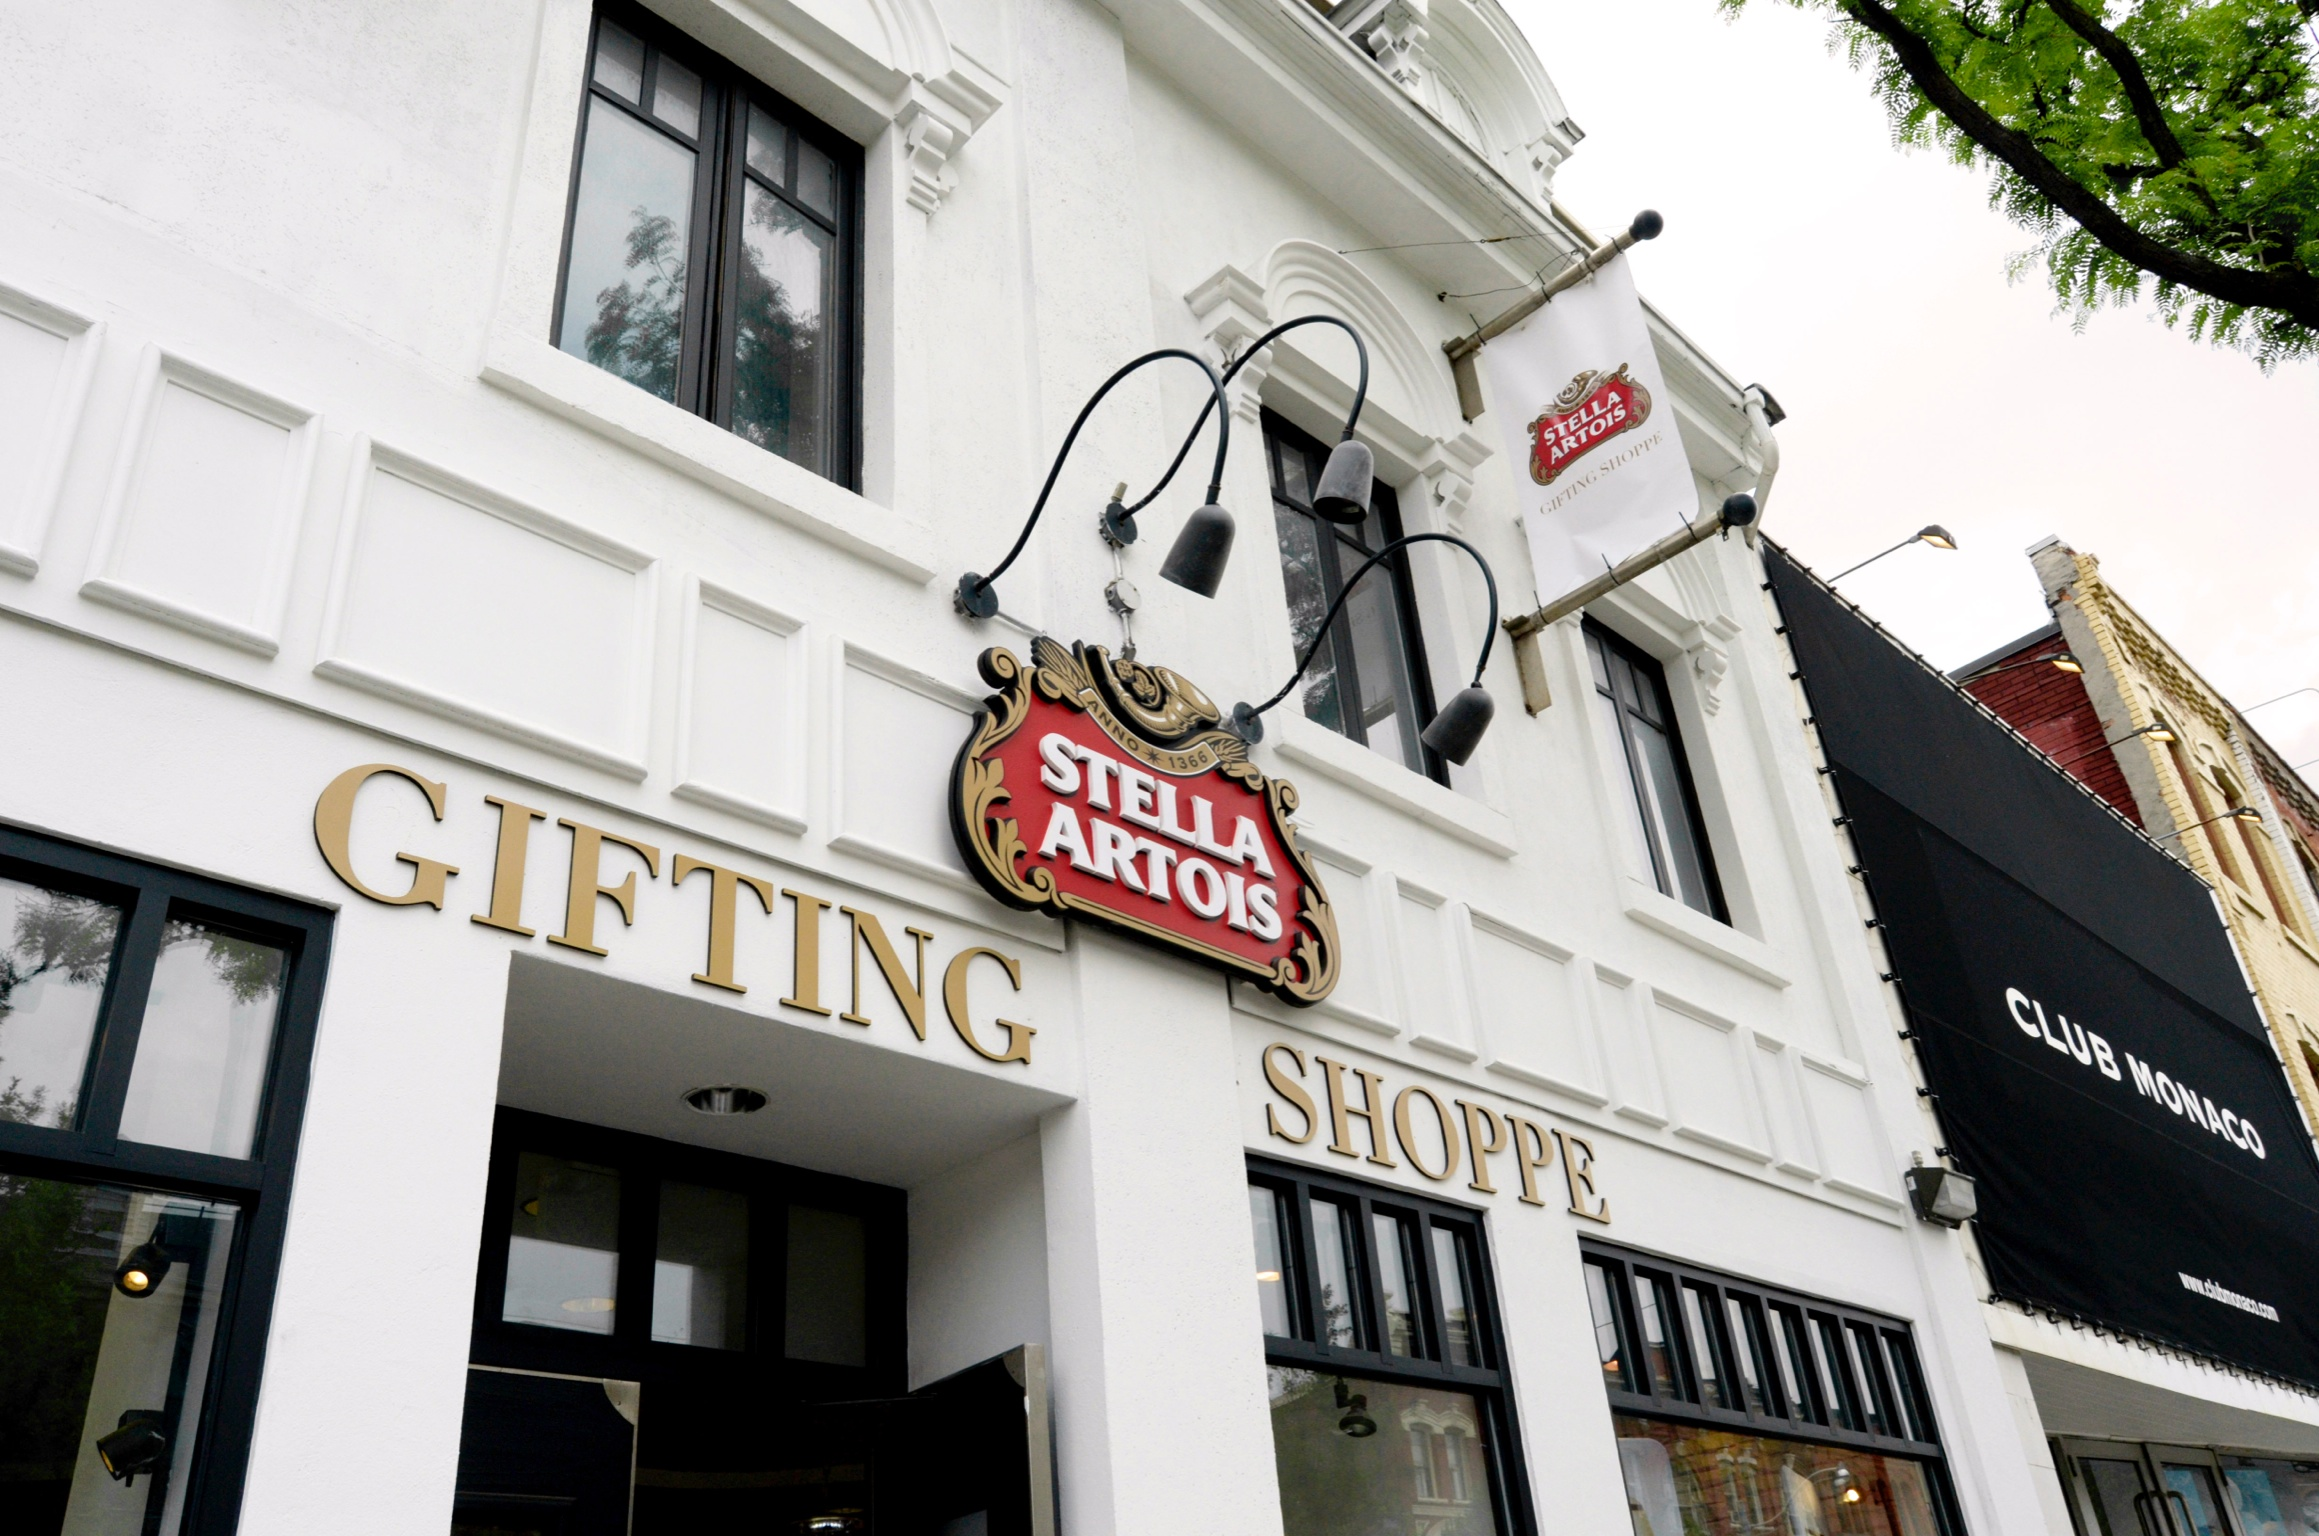 Stella Gifting Shoppe1.jpg